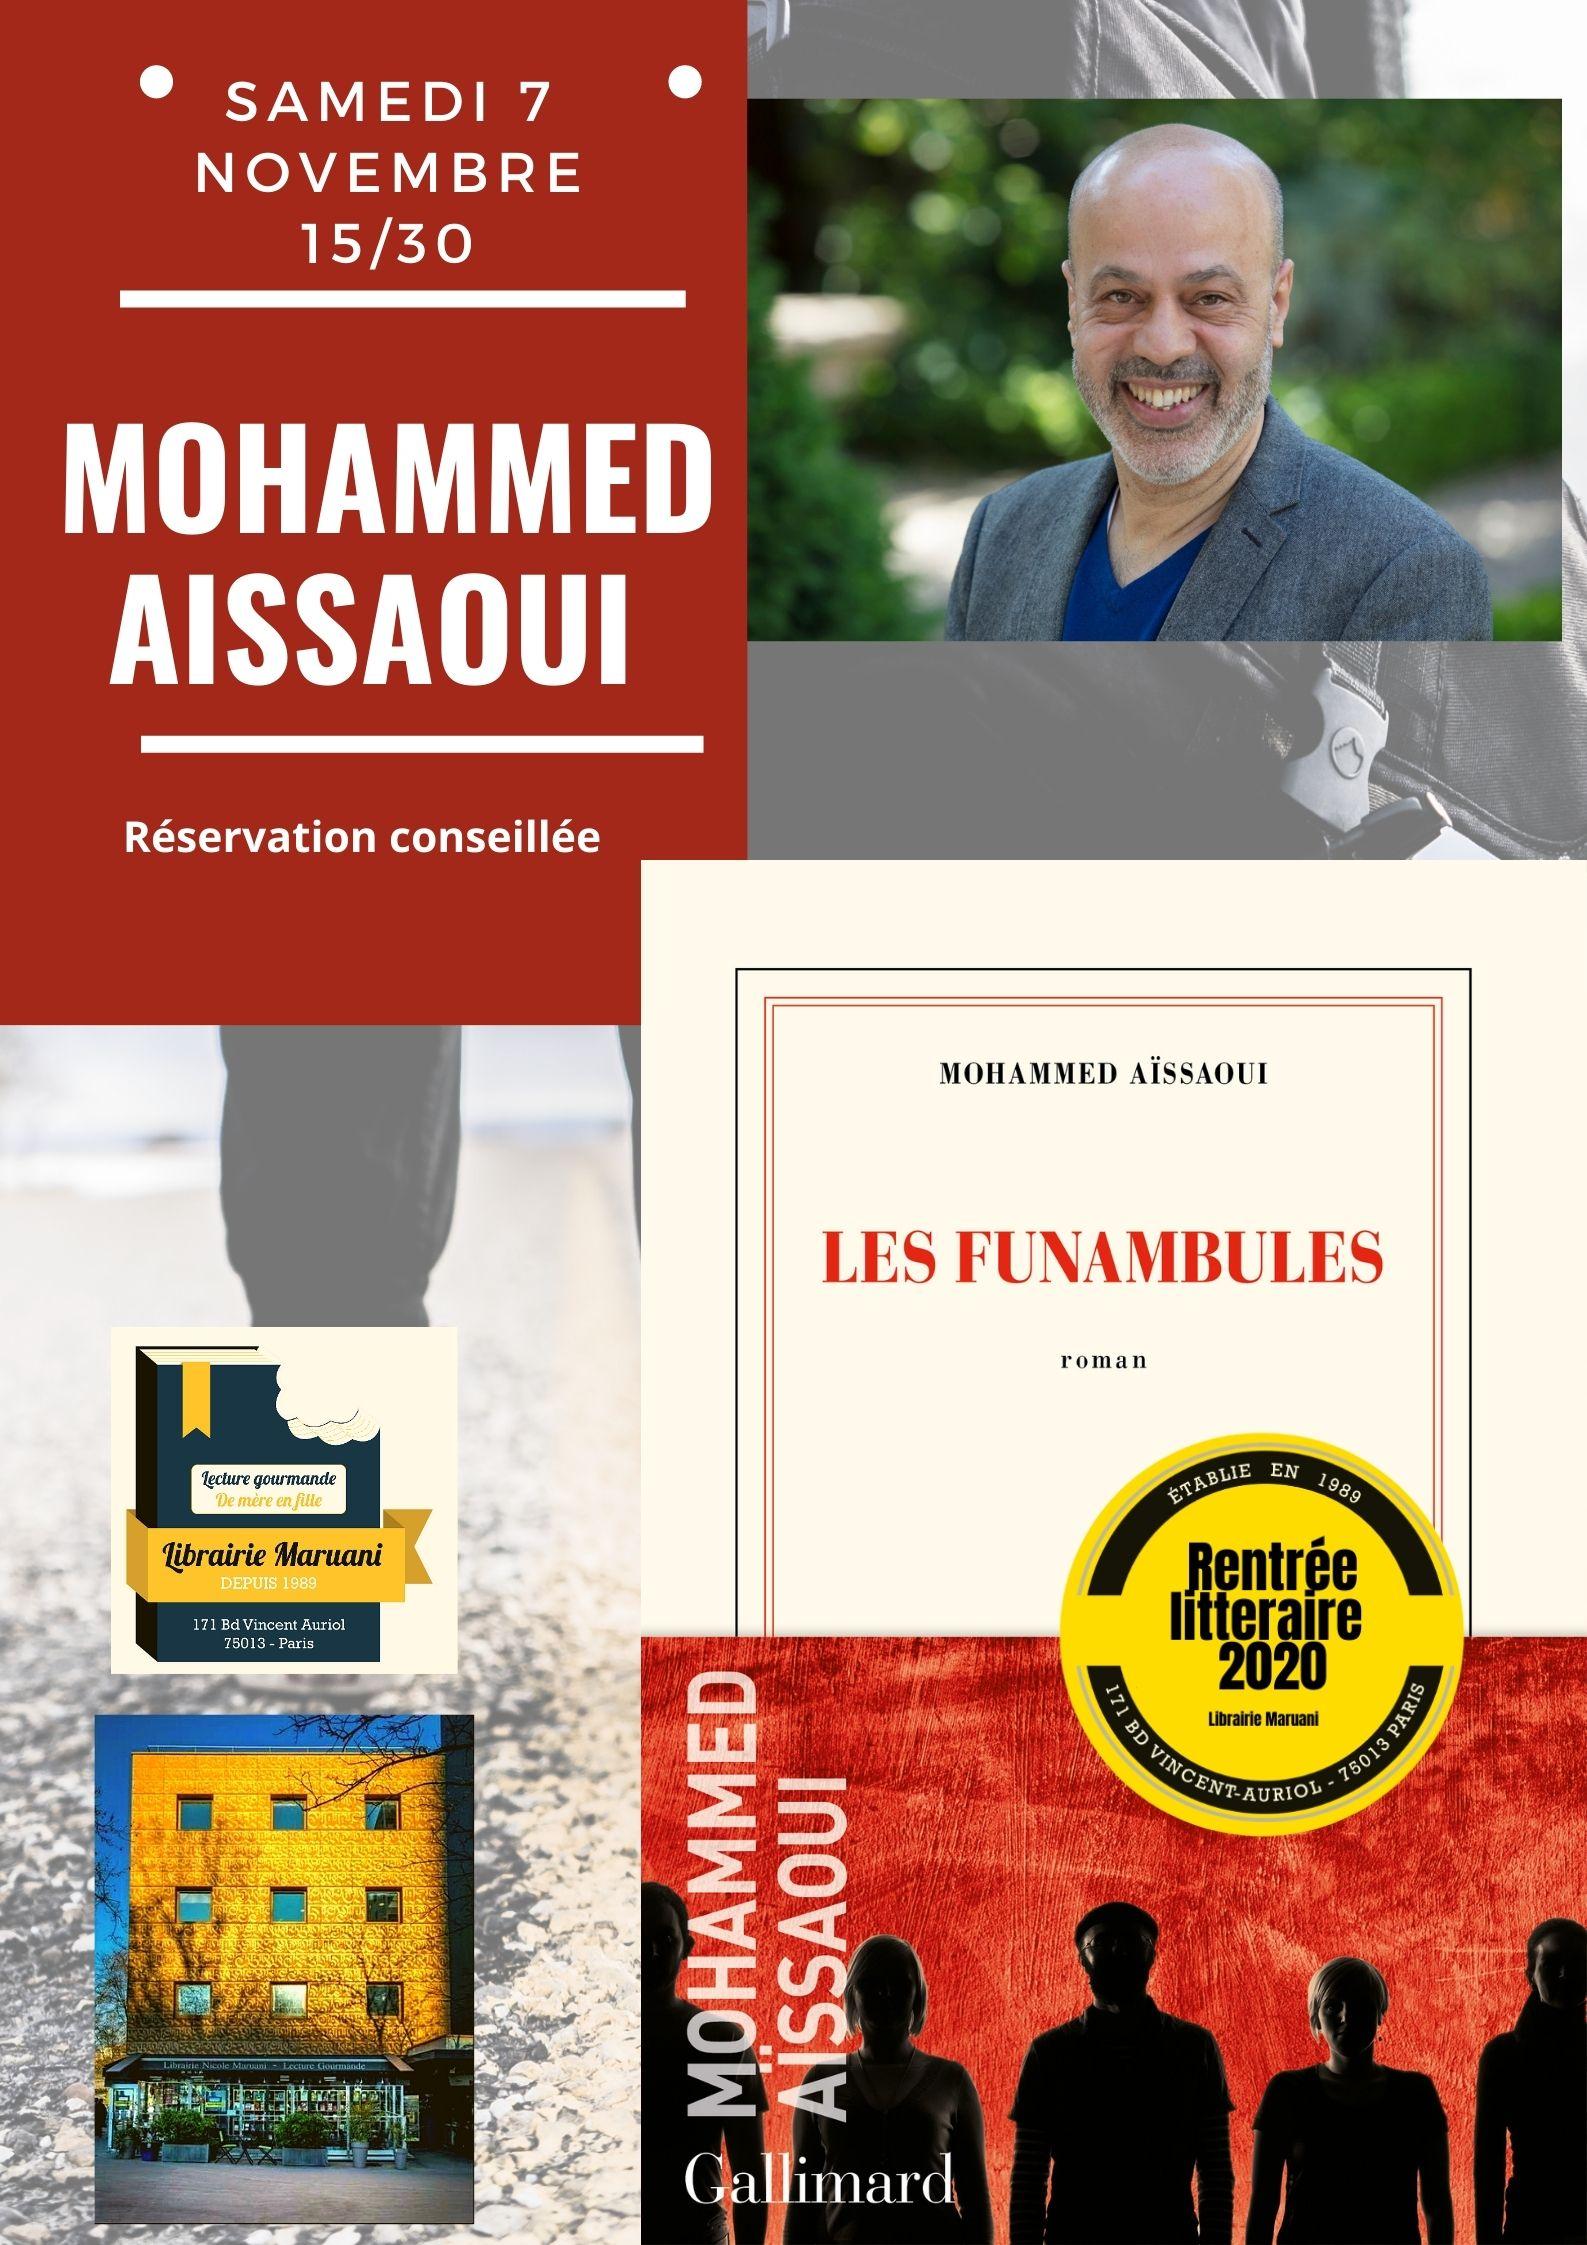 Rencontre Mohammed Aissaoui